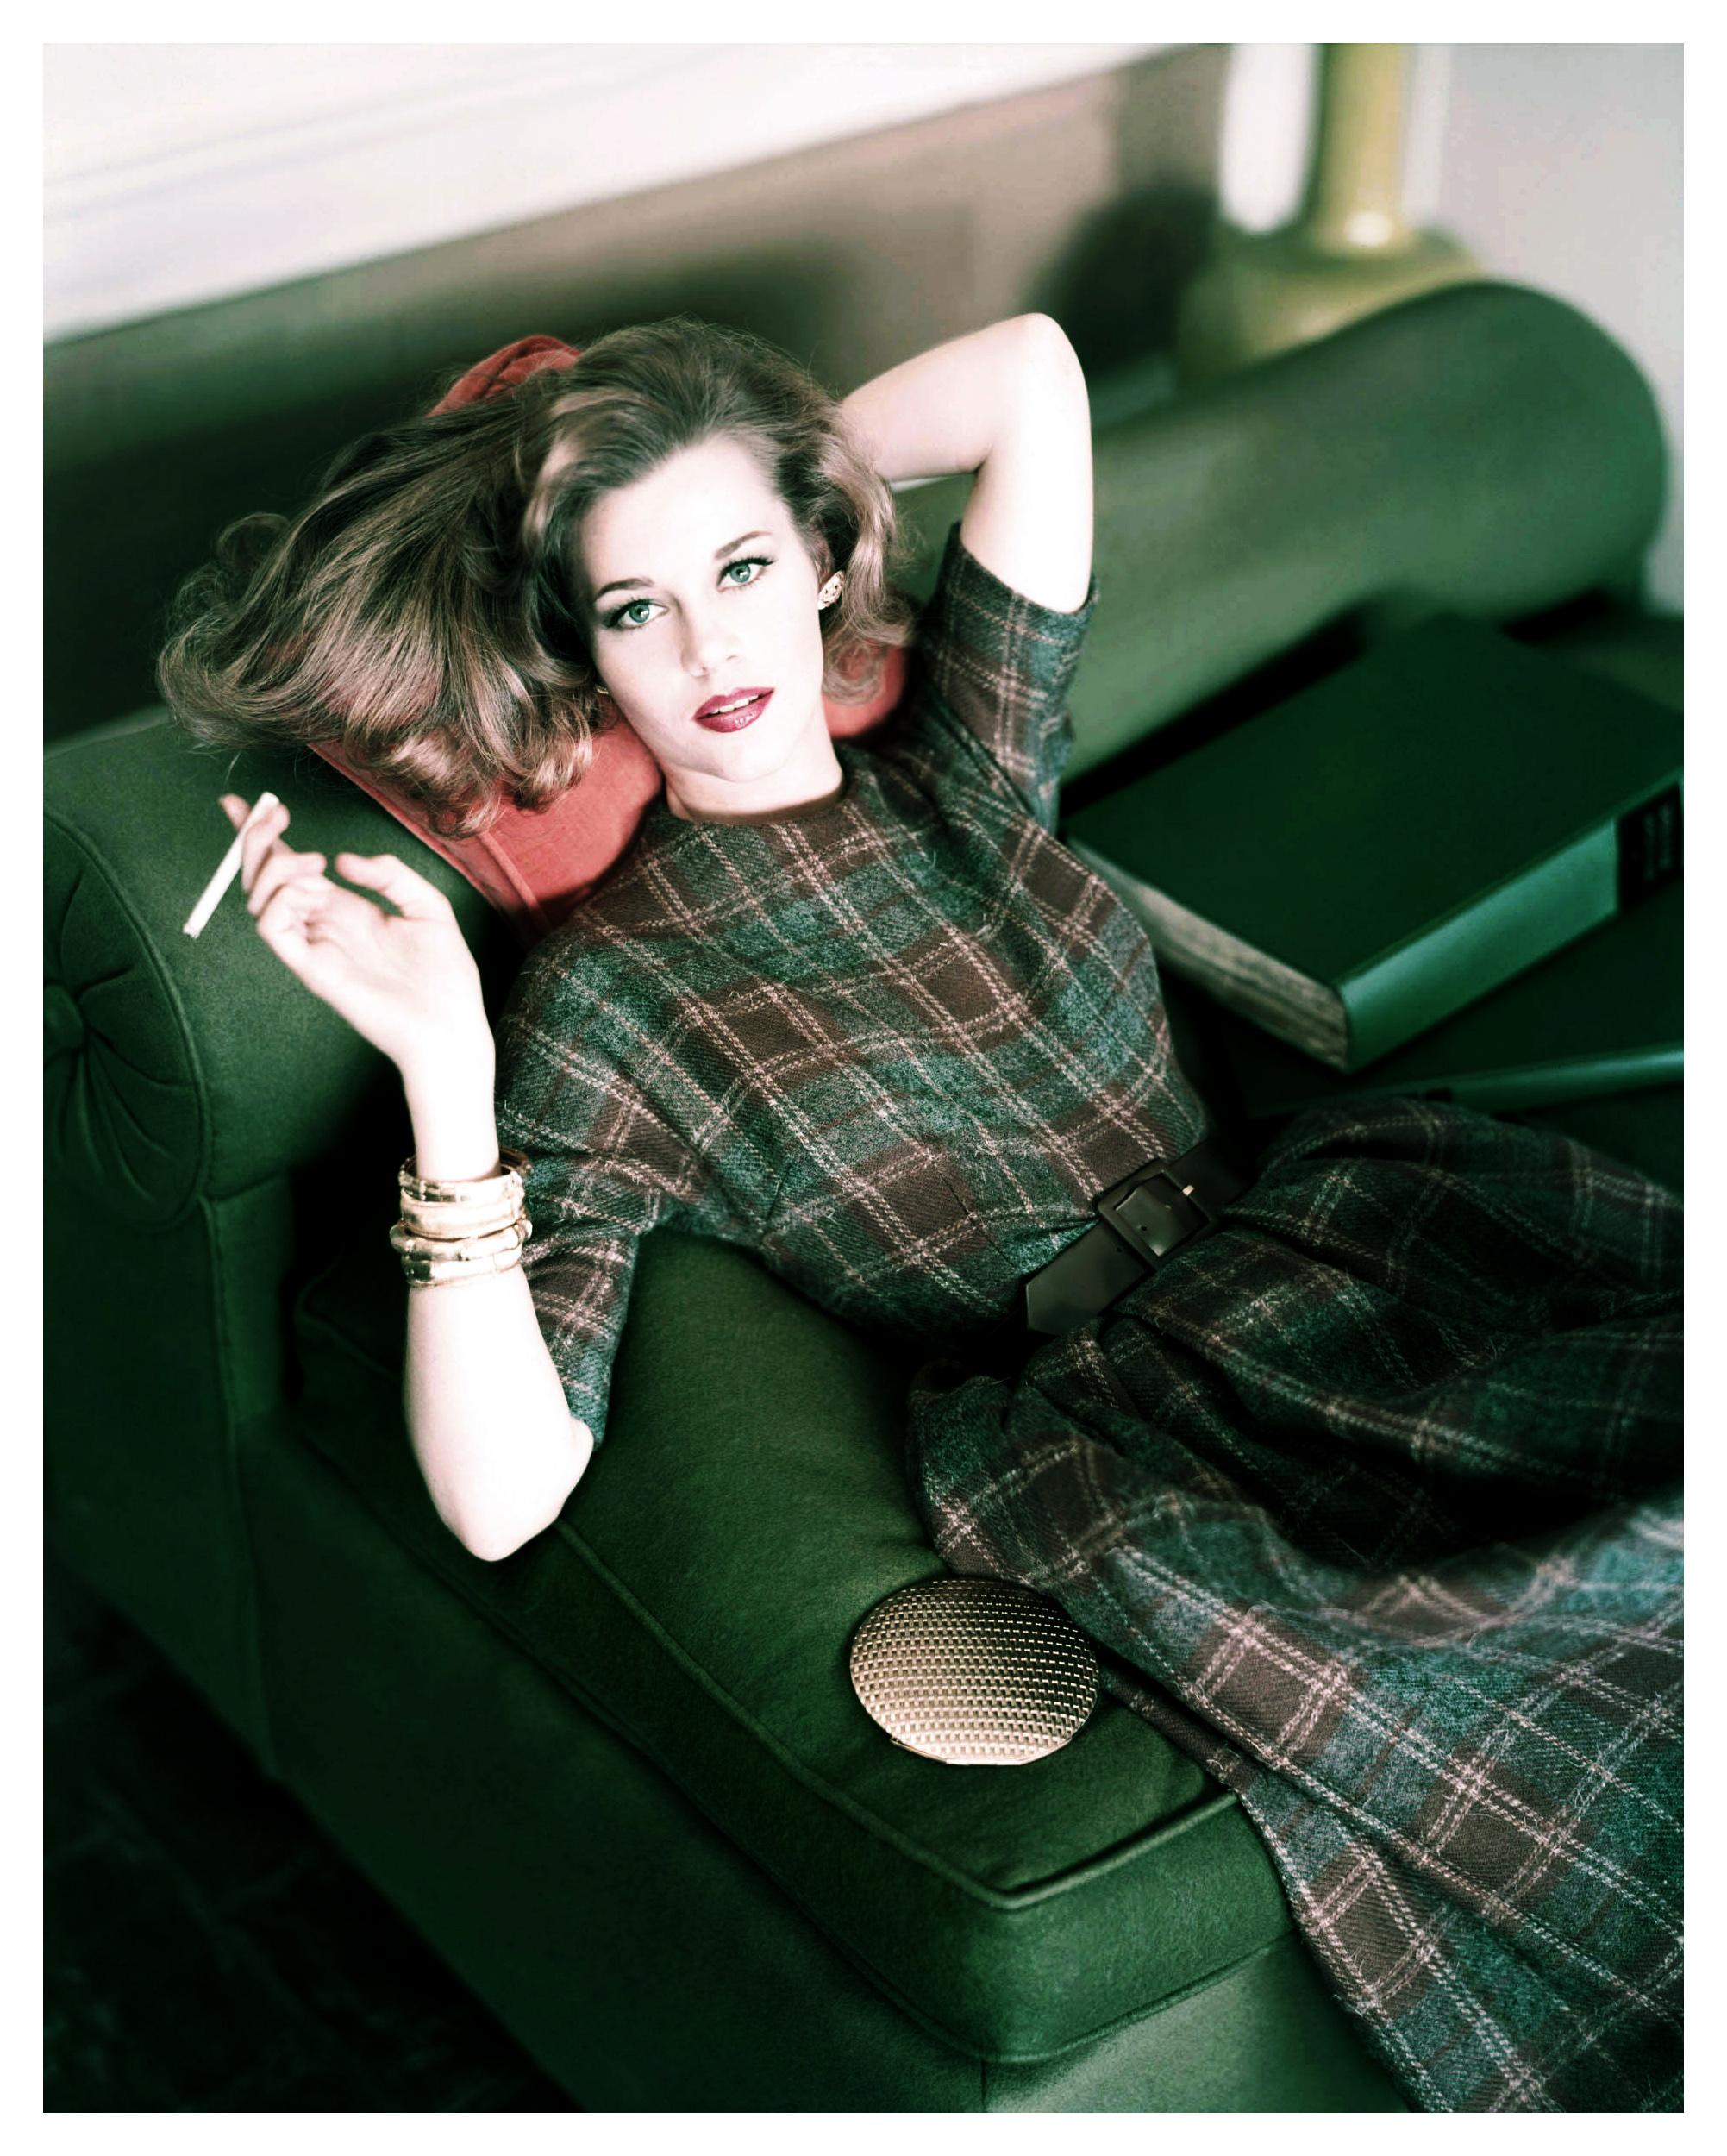 Jane Fonda Photo Horst P.Horst 1959 | © Pleasurephoto